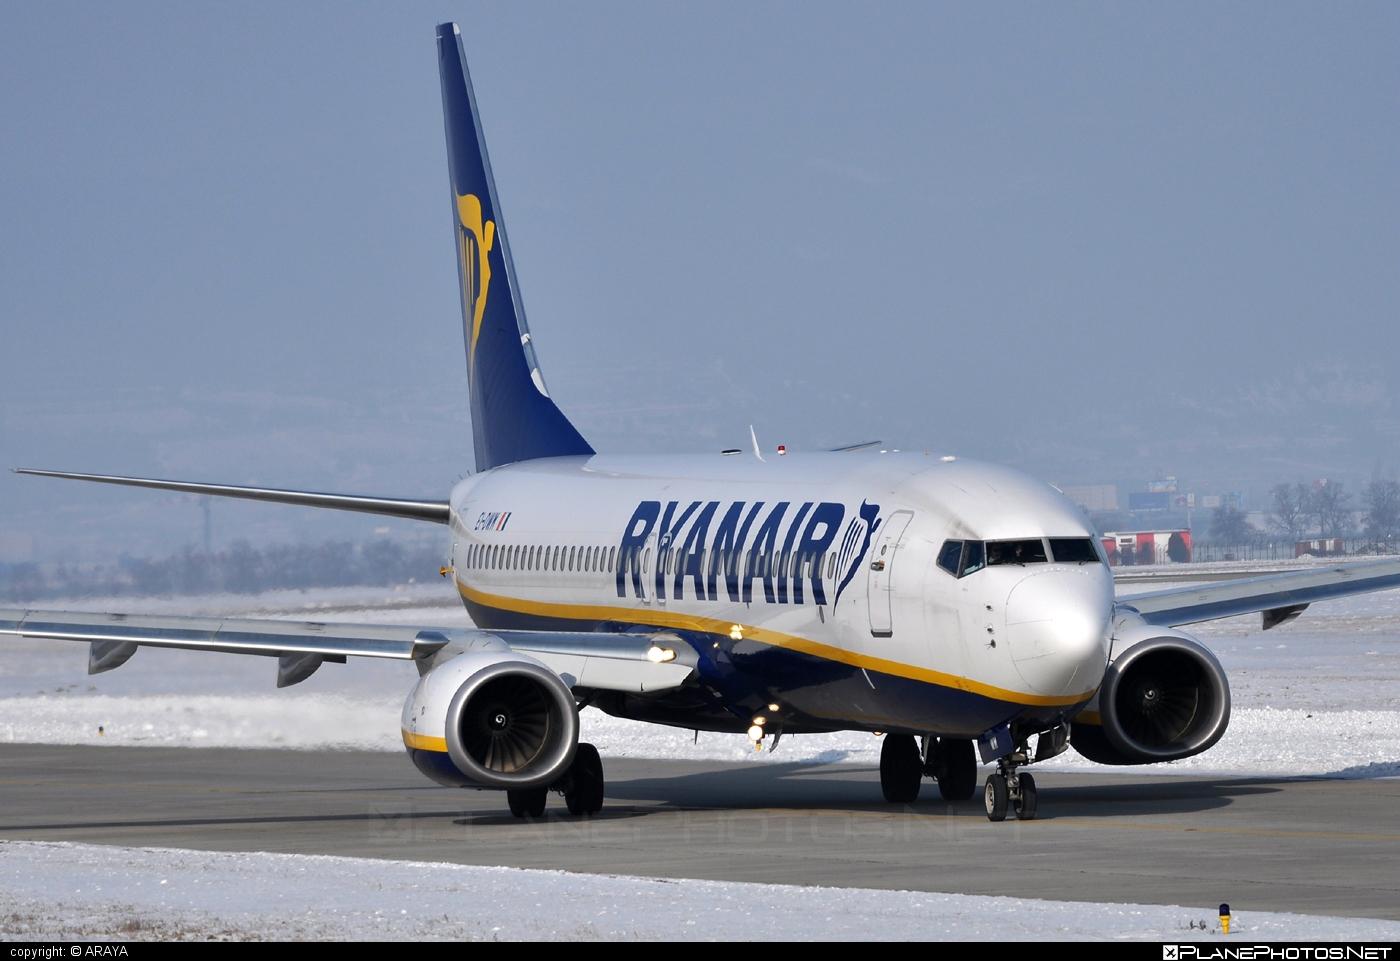 Boeing 737-800 - EI-DWM operated by Ryanair #b737 #b737nextgen #b737ng #boeing #boeing737 #ryanair